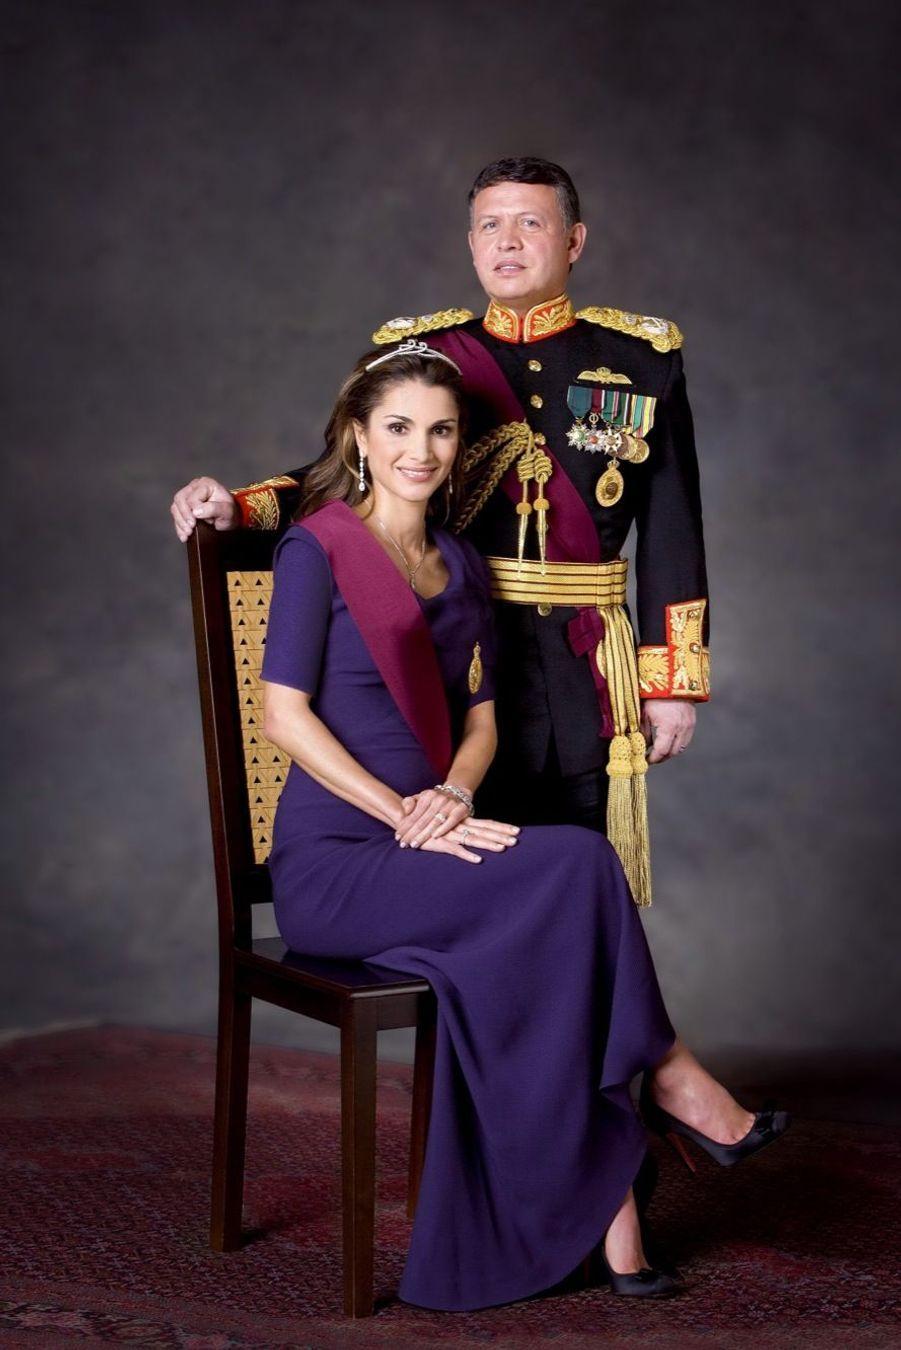 Rania avec le roi Abdallah en 2008